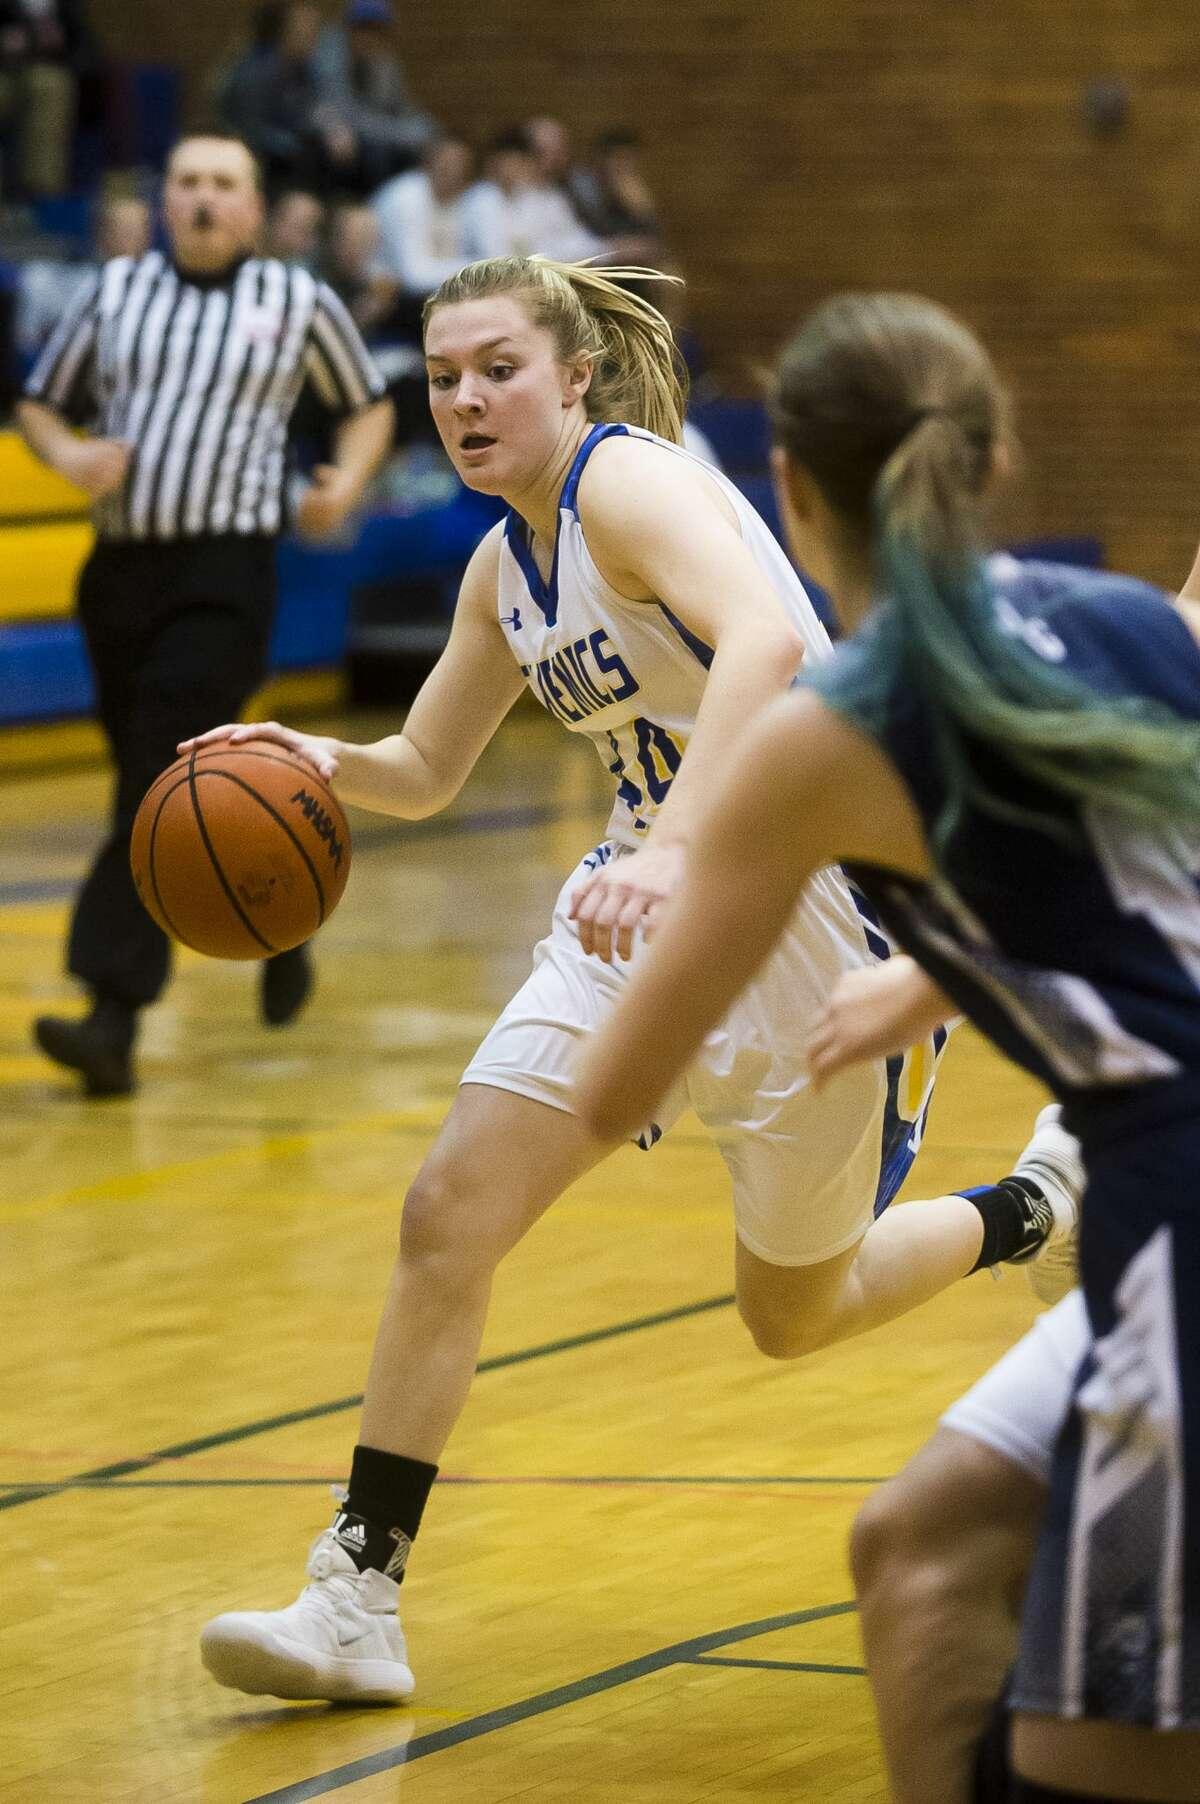 Midland senior Maddie Barrie dribbles toward the basket during the Chemics' game against John Glenn on Tuesday, Feb. 20, 2018 at Midland High School. (Katy Kildee/kkildee@mdn.net)